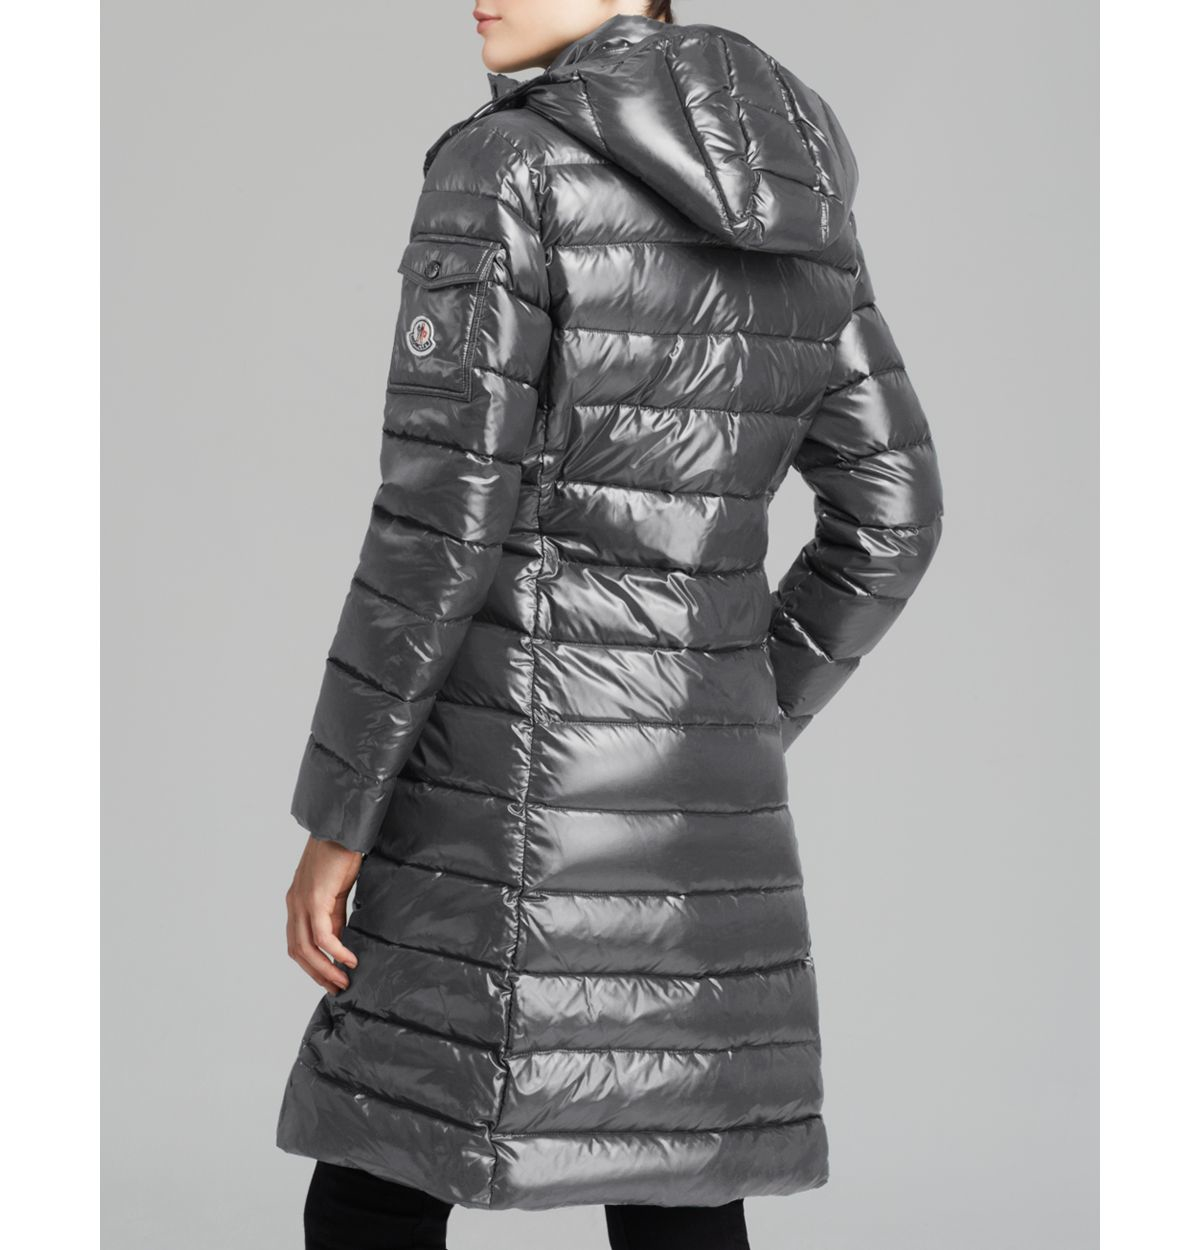 cc8a15bfbcf4 Lyst - Moncler Moka Mid Length Down Coat in Gray